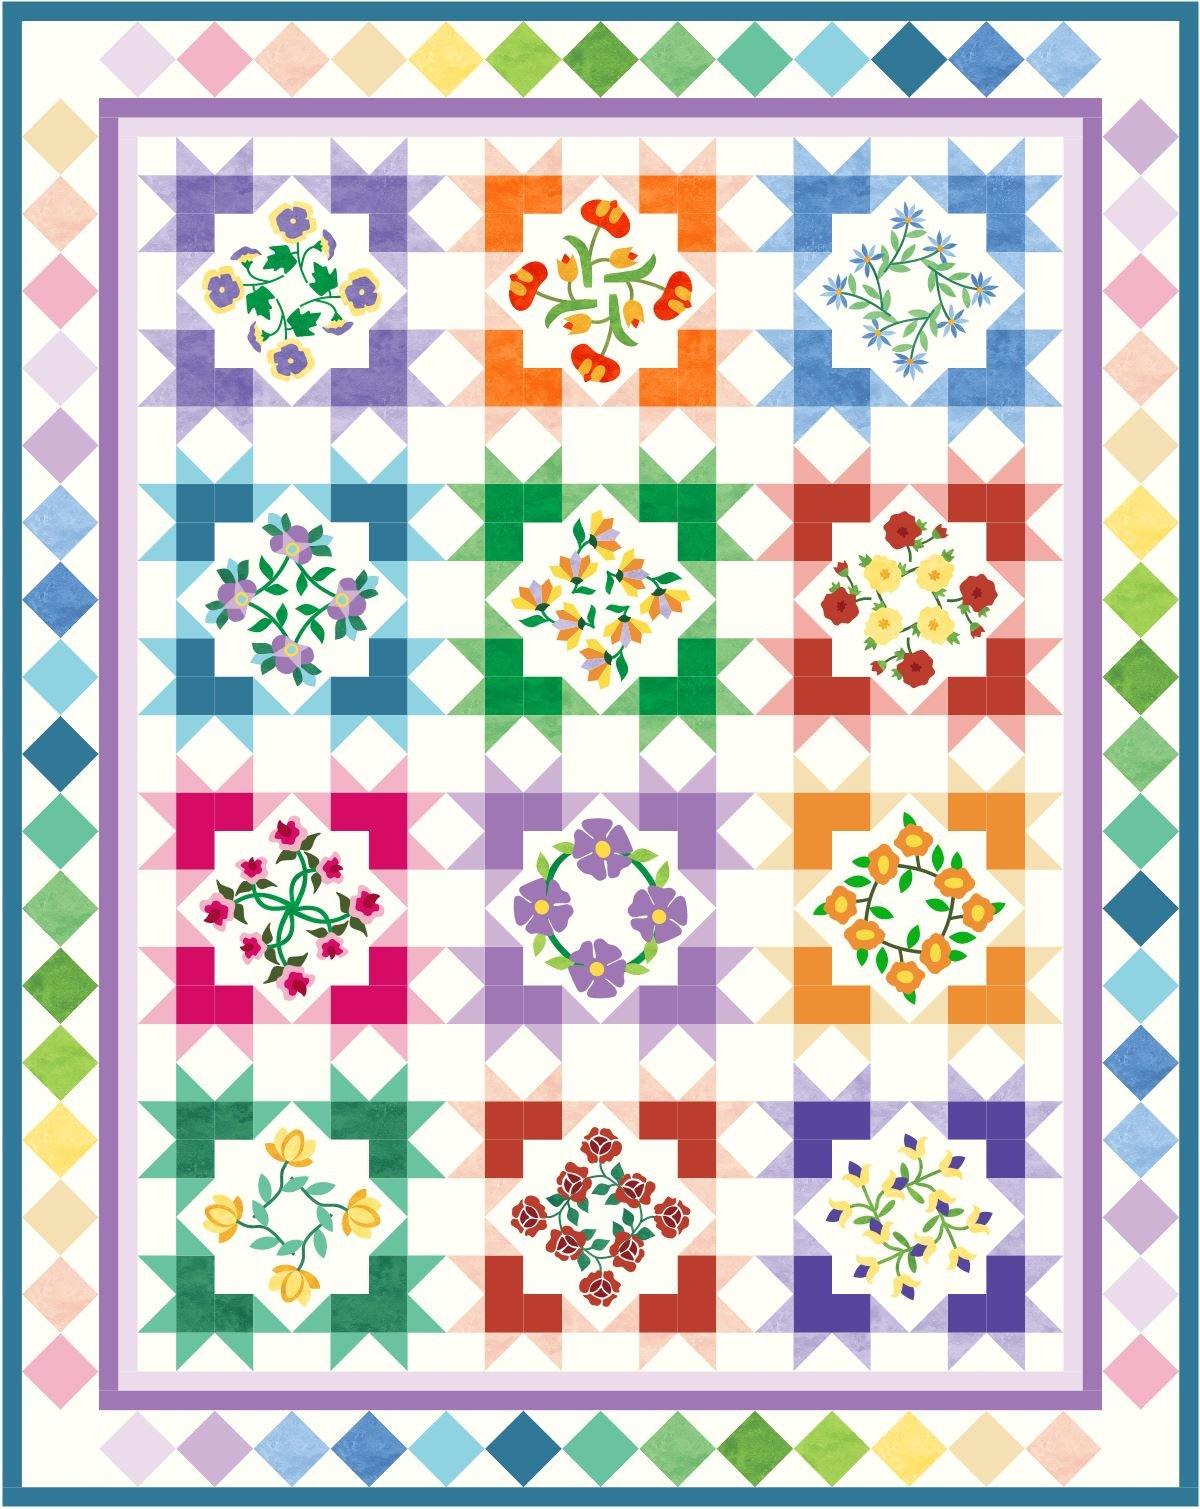 Starburst Blossom Complete Pattern